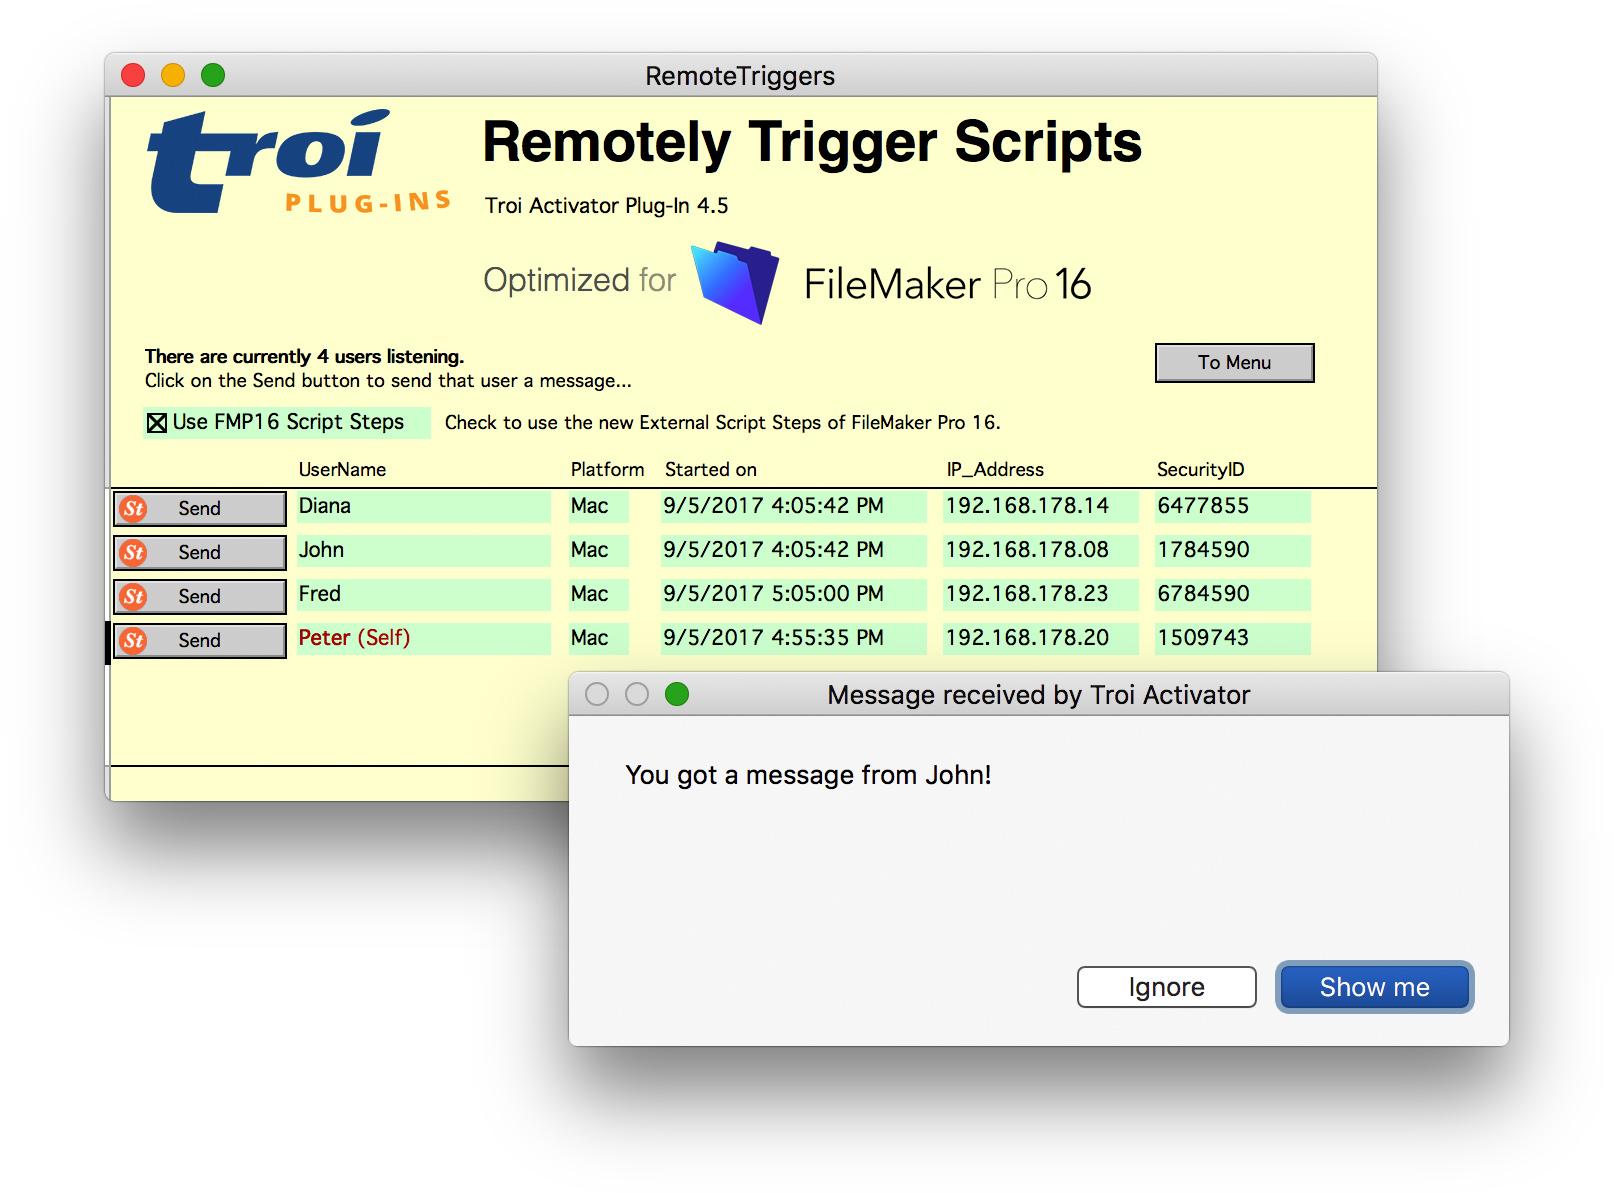 Activator Plug-in for FileMaker Pro 17: Trigger scripts (Remote Trigger)